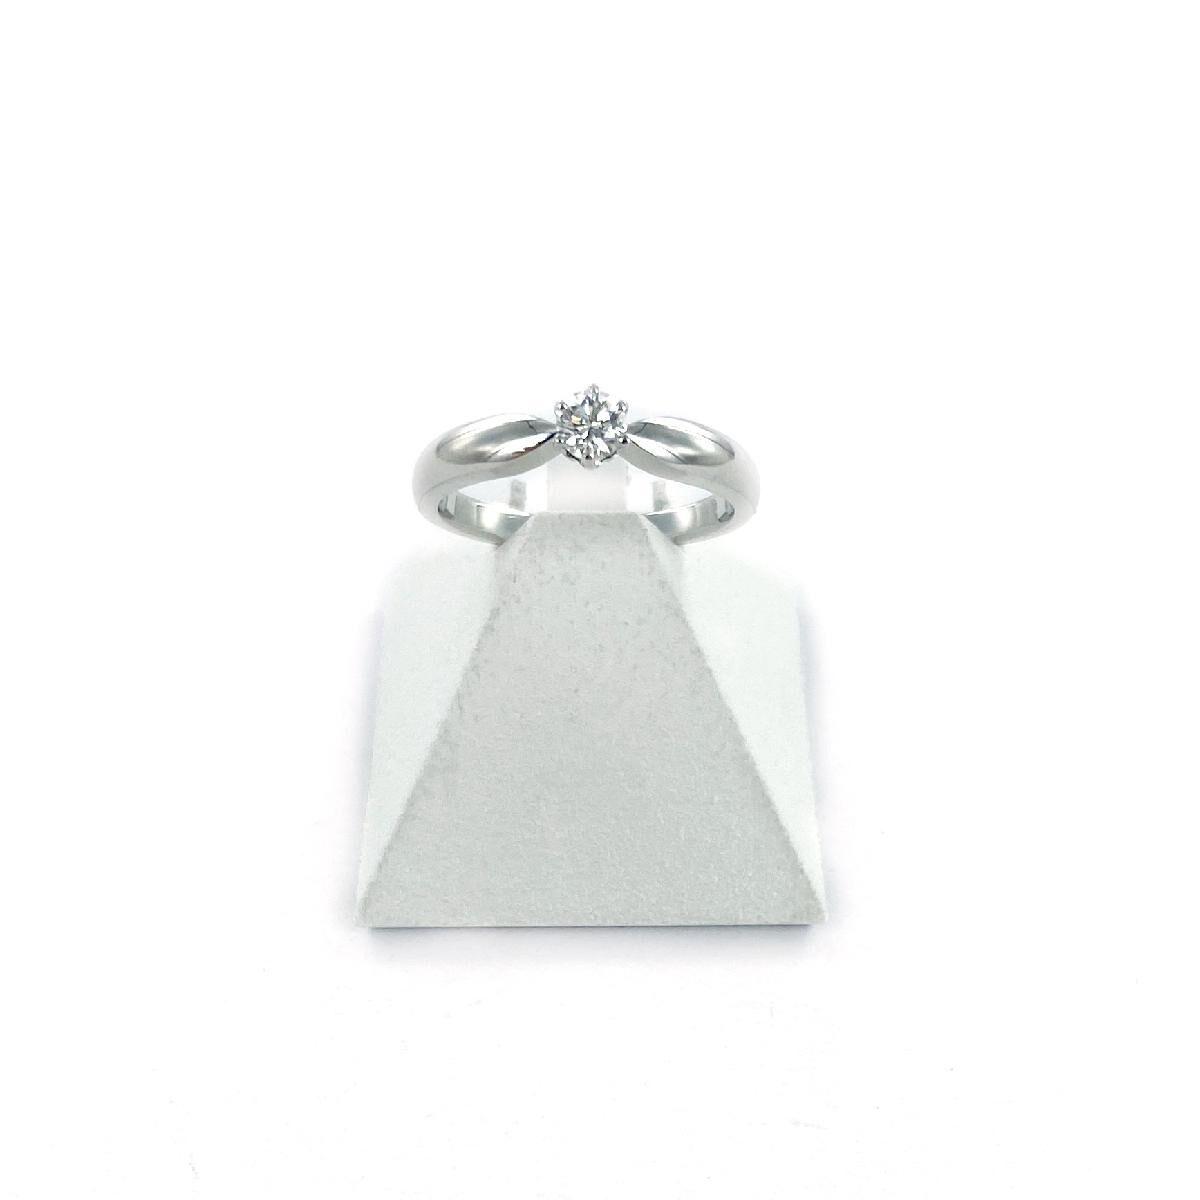 MATY Solitaire or 750 blanc diamant 0,15 carat- MATY